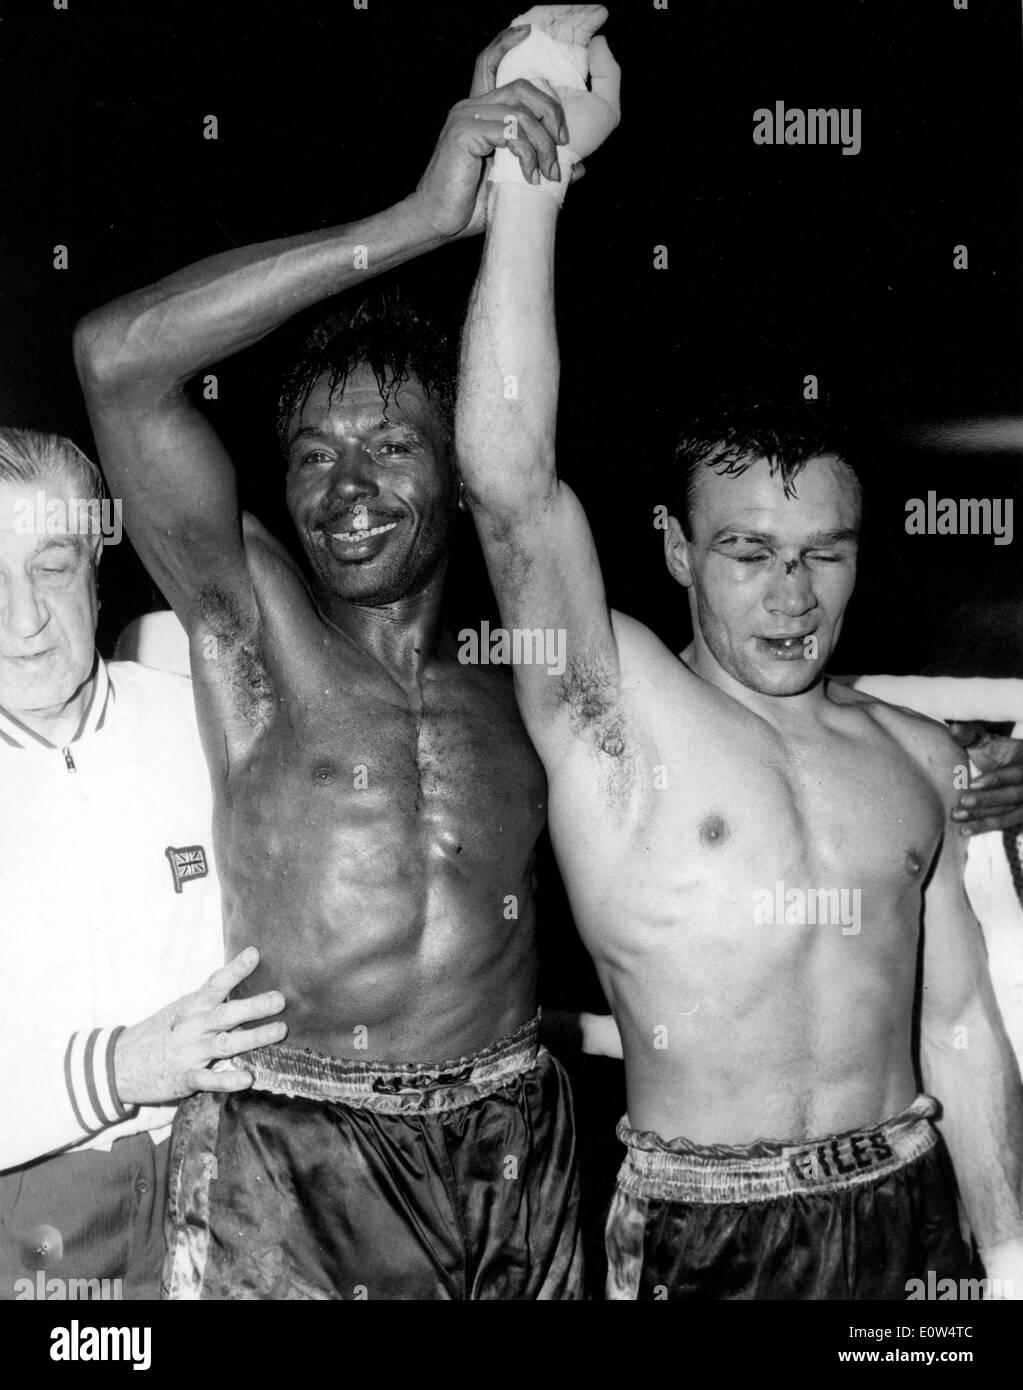 Boxer Joe Brown beats Dave Charnley at Earls Courts - Stock Image